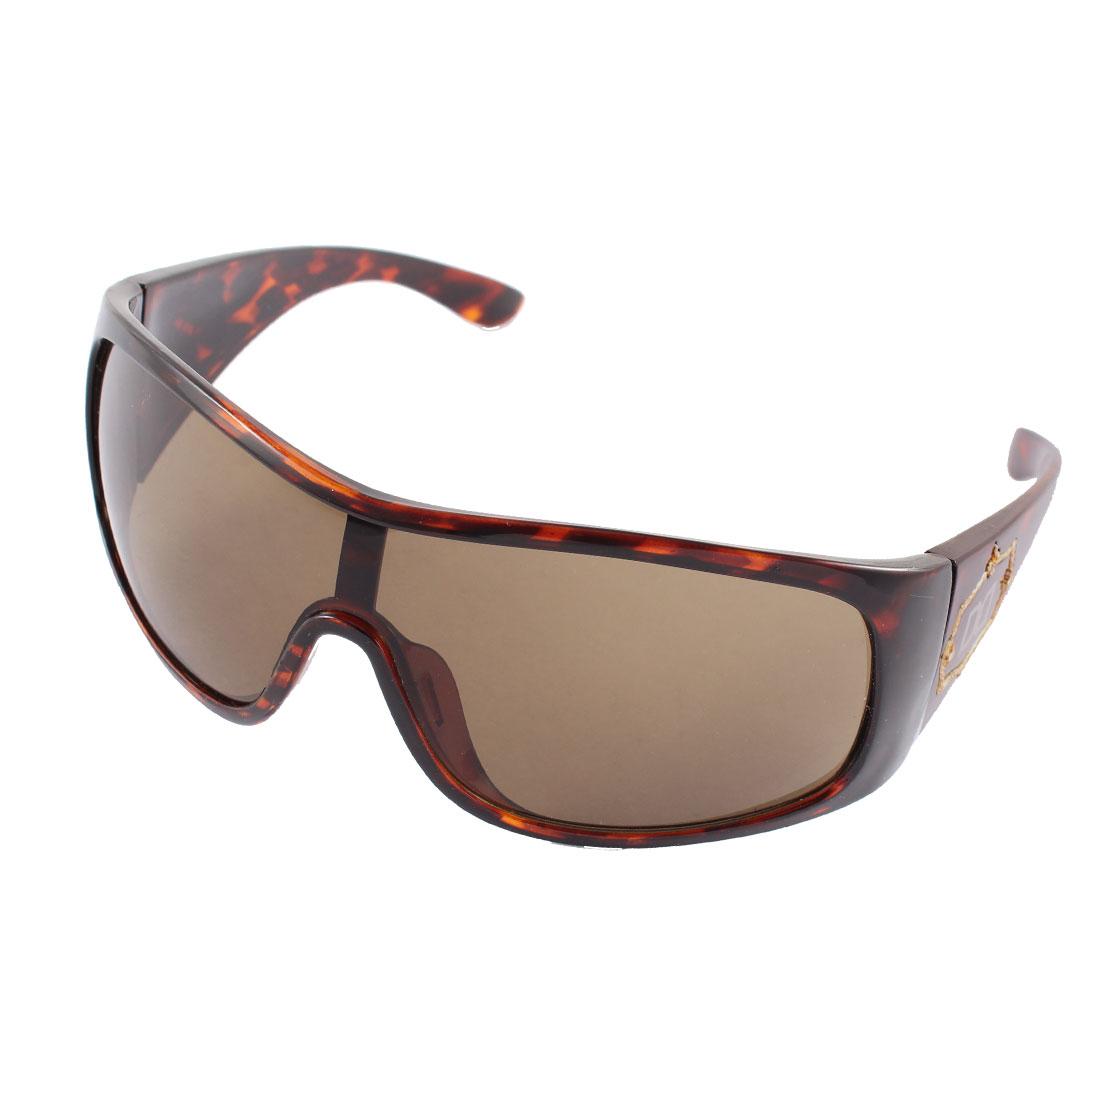 Full Rim Animal Print Women Sunglasses Outdoor Driving Eyewear Brown